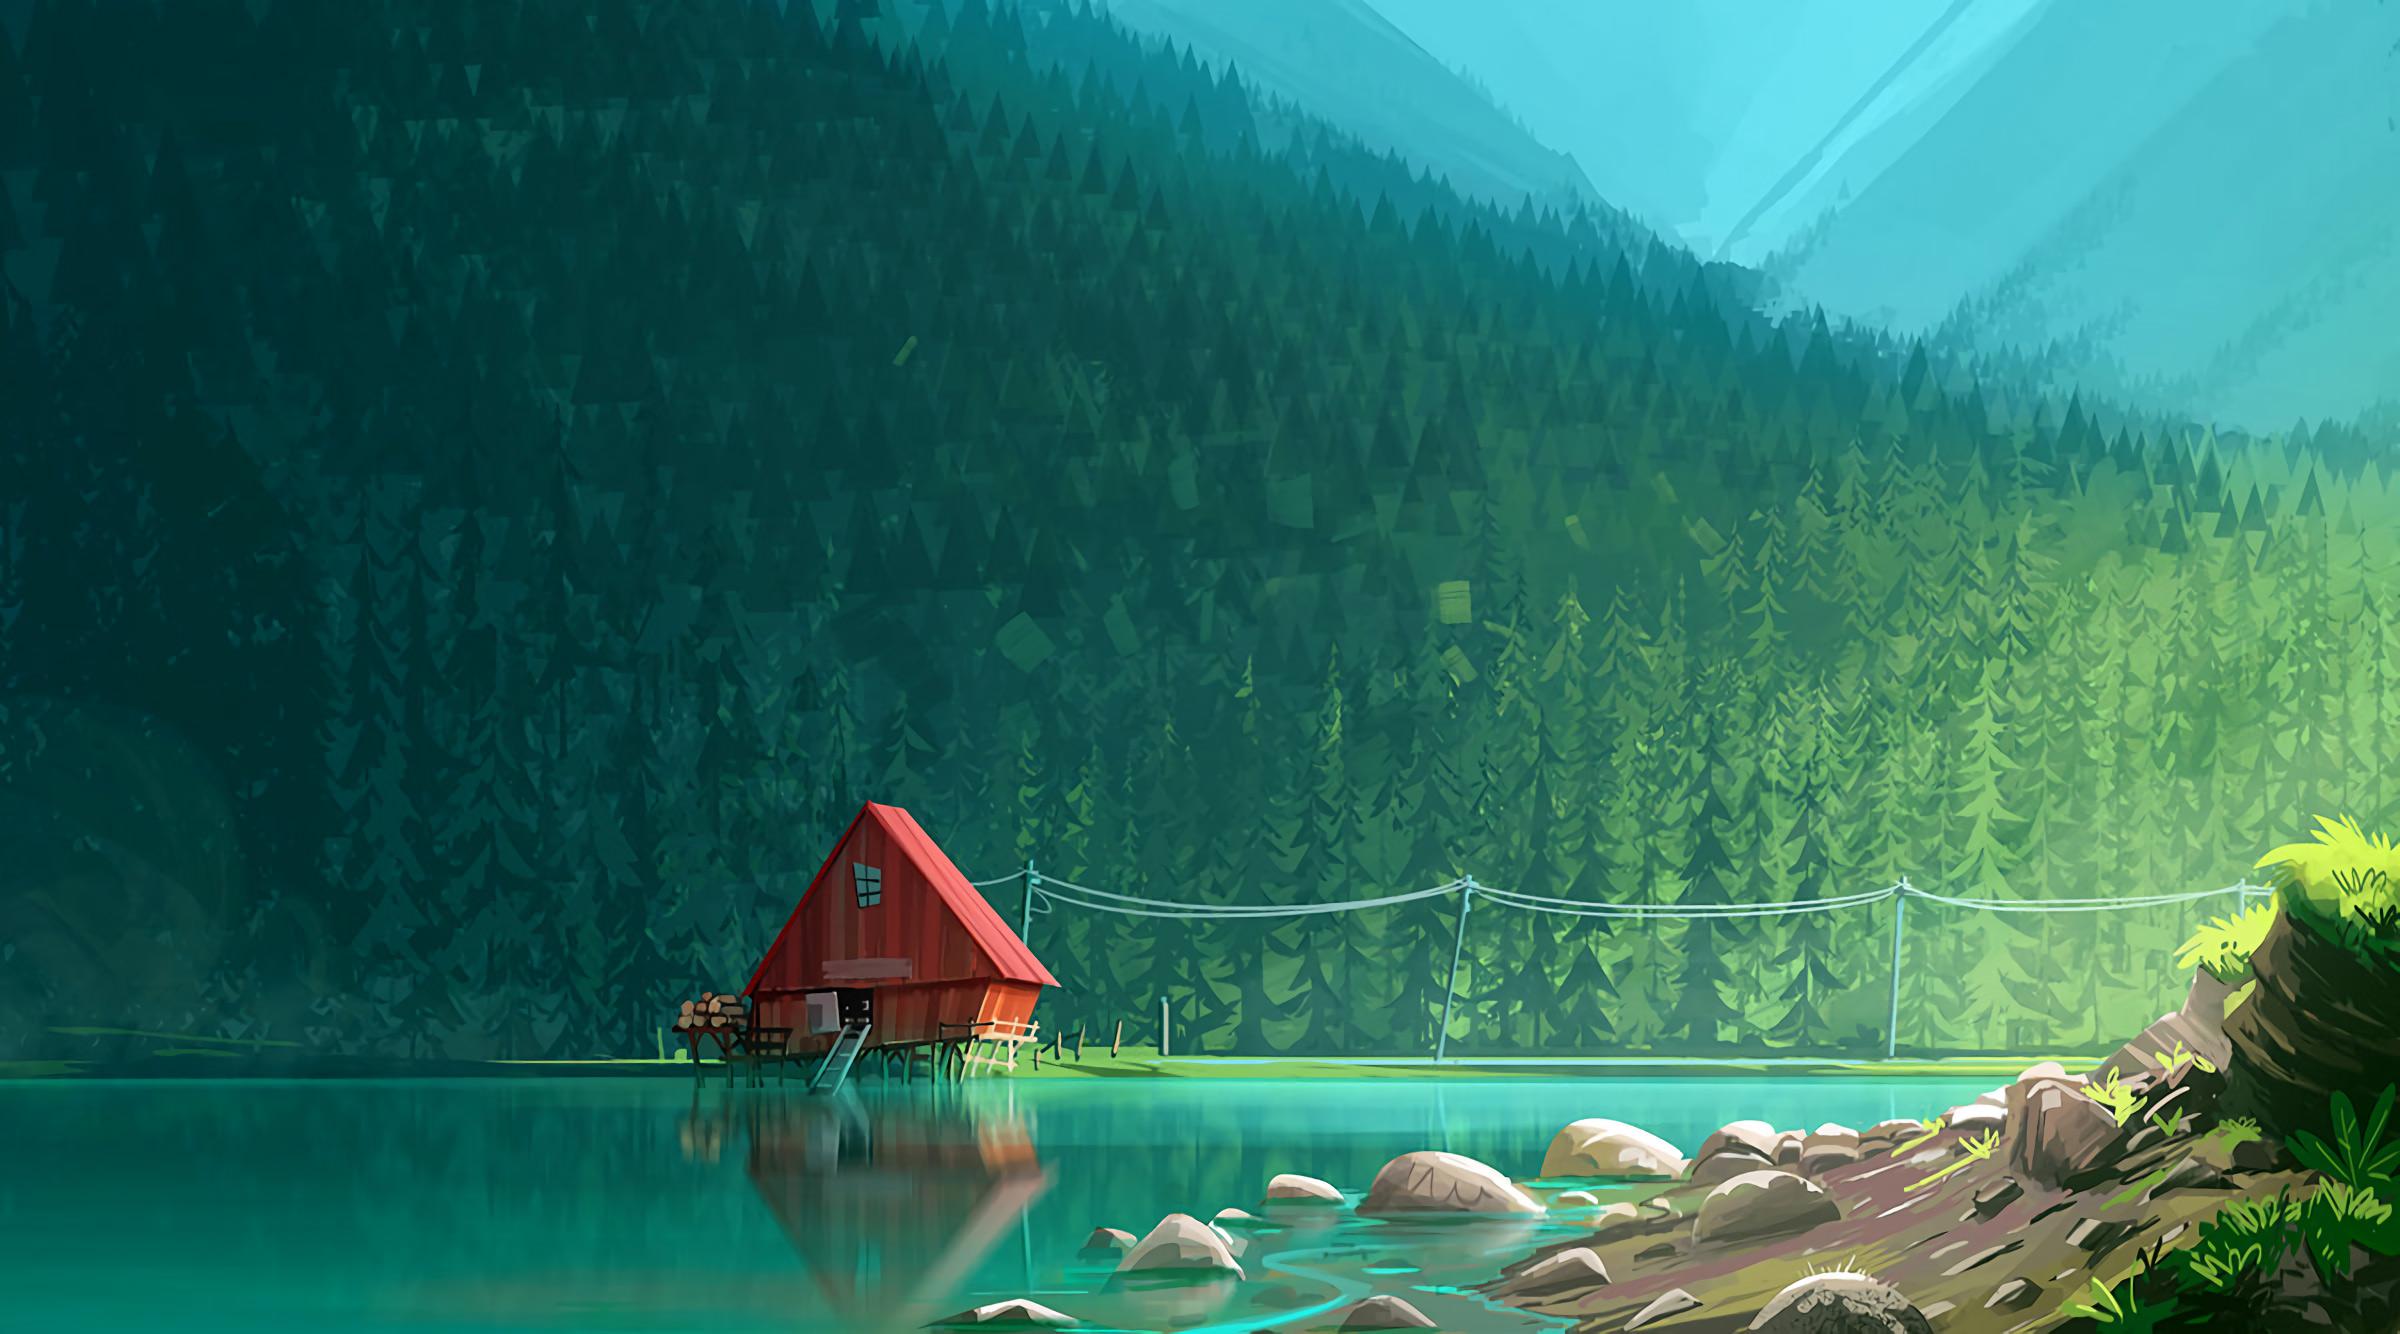 Download Engine 3d Live Wallpaper House In Woods Minimalism Artwork Hd Artist 4k